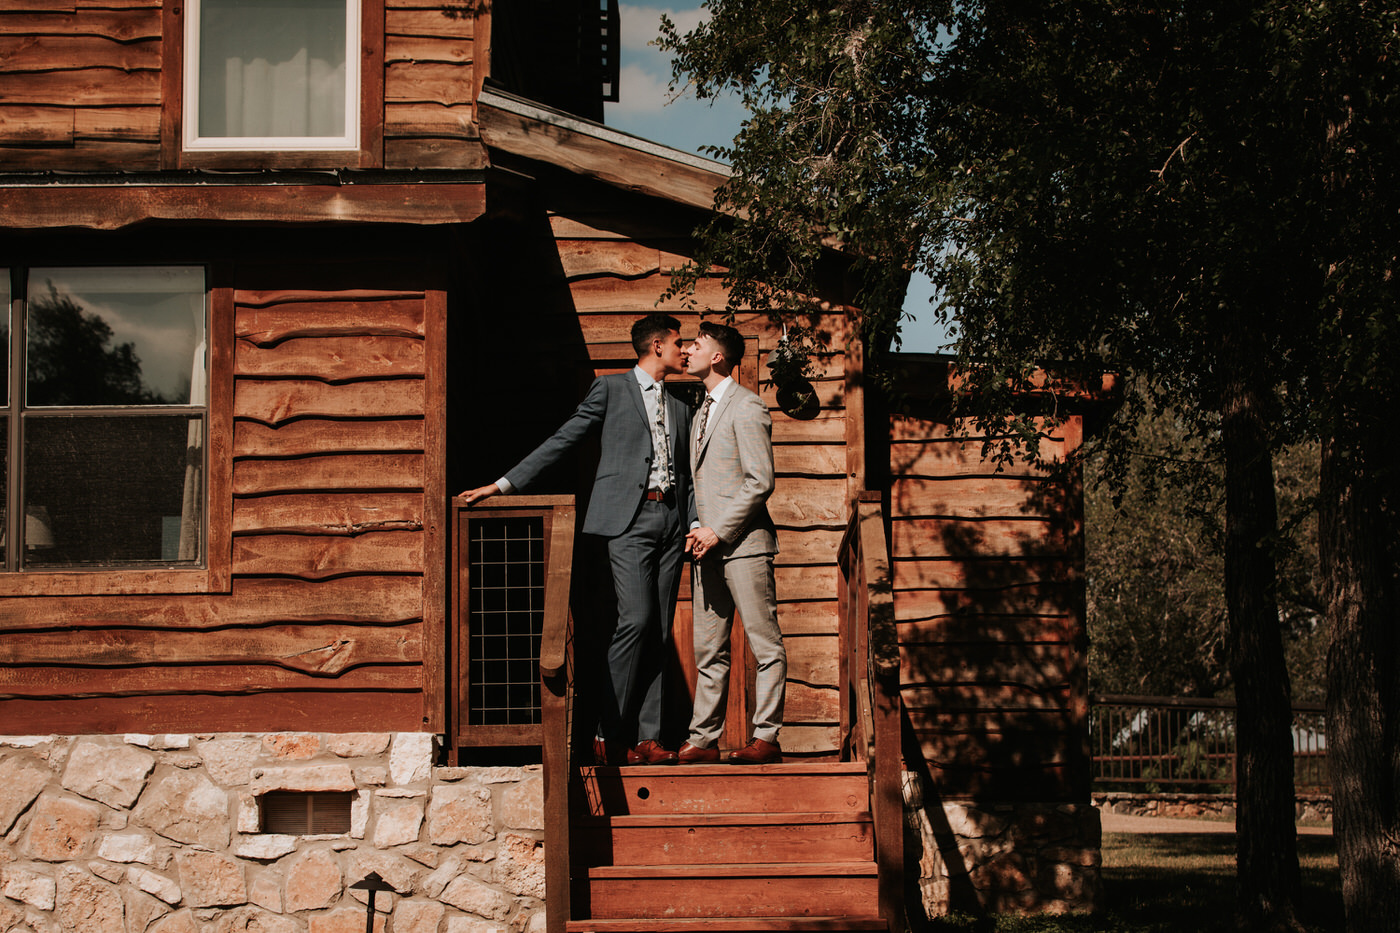 Riverhouse at Pedernales LGBTQ Wedding - Diana Ascarrunz Photography -560.jpg